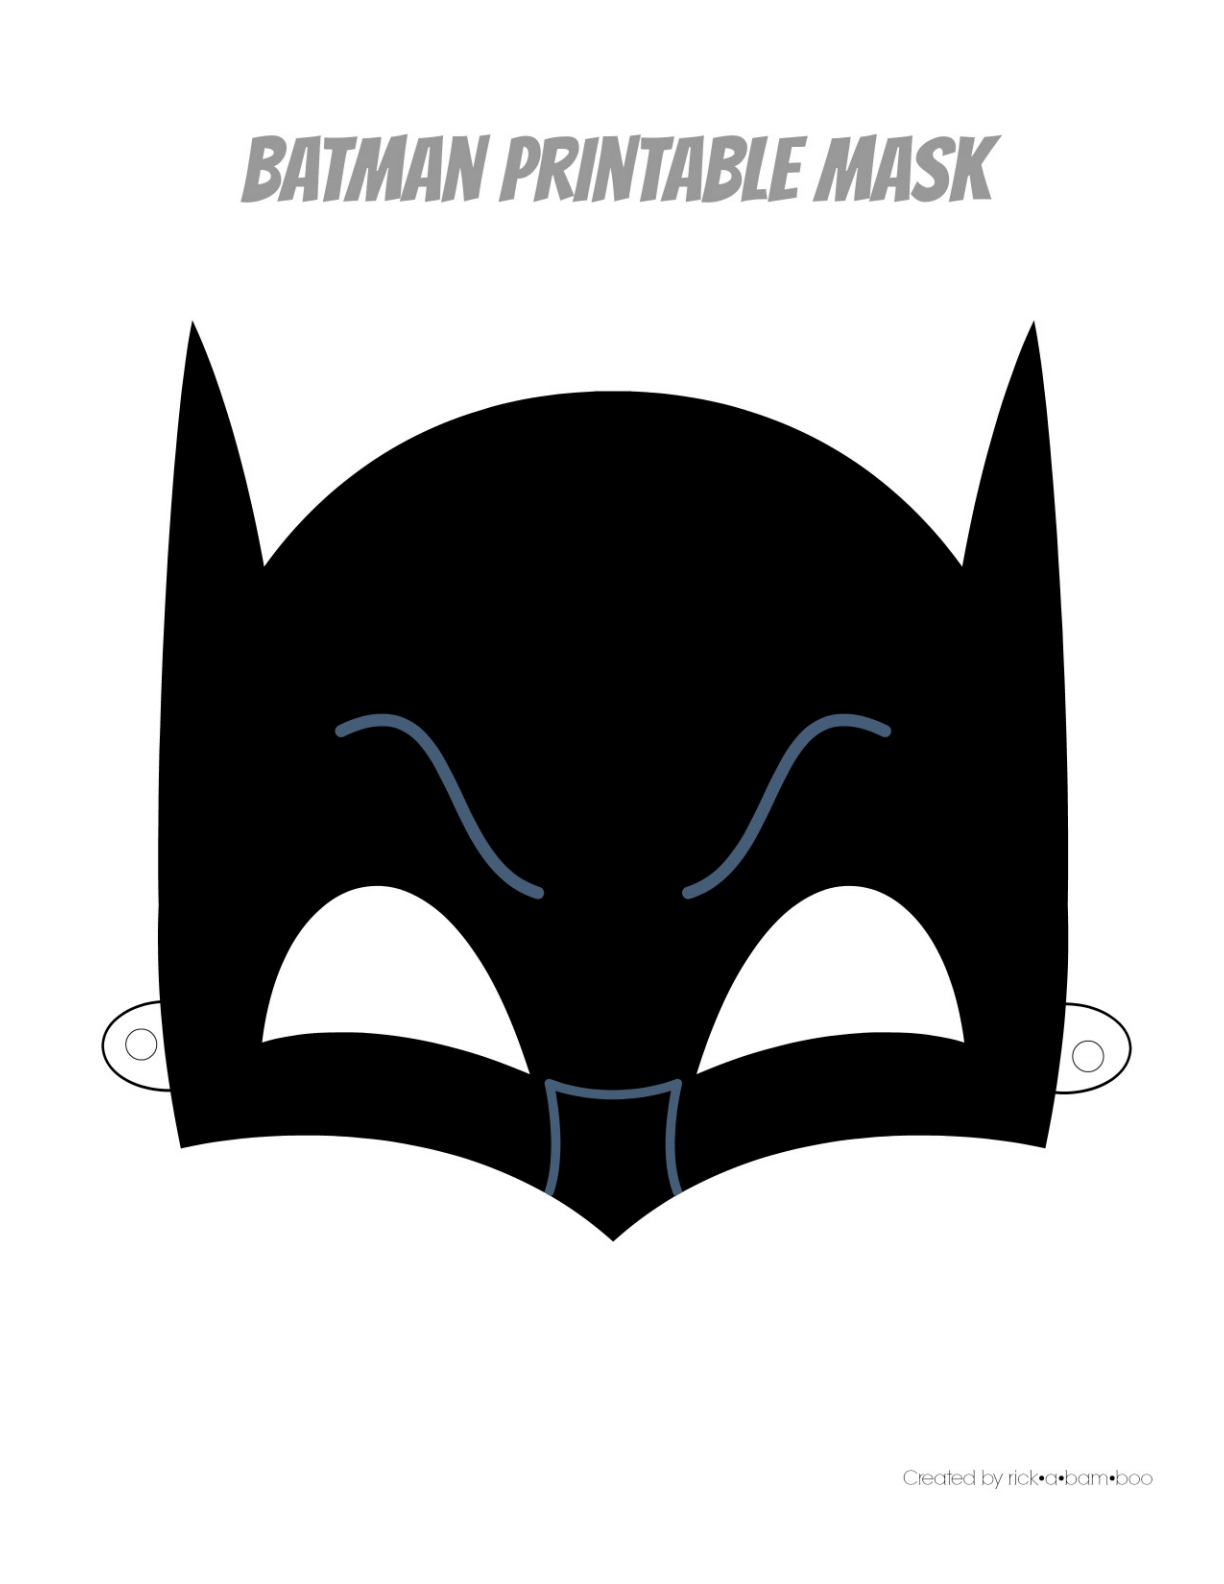 Shared With Dropbox | $3 Or Less | Pinterest | Antifaz, Fiestas - Free Printable Superhero Masks